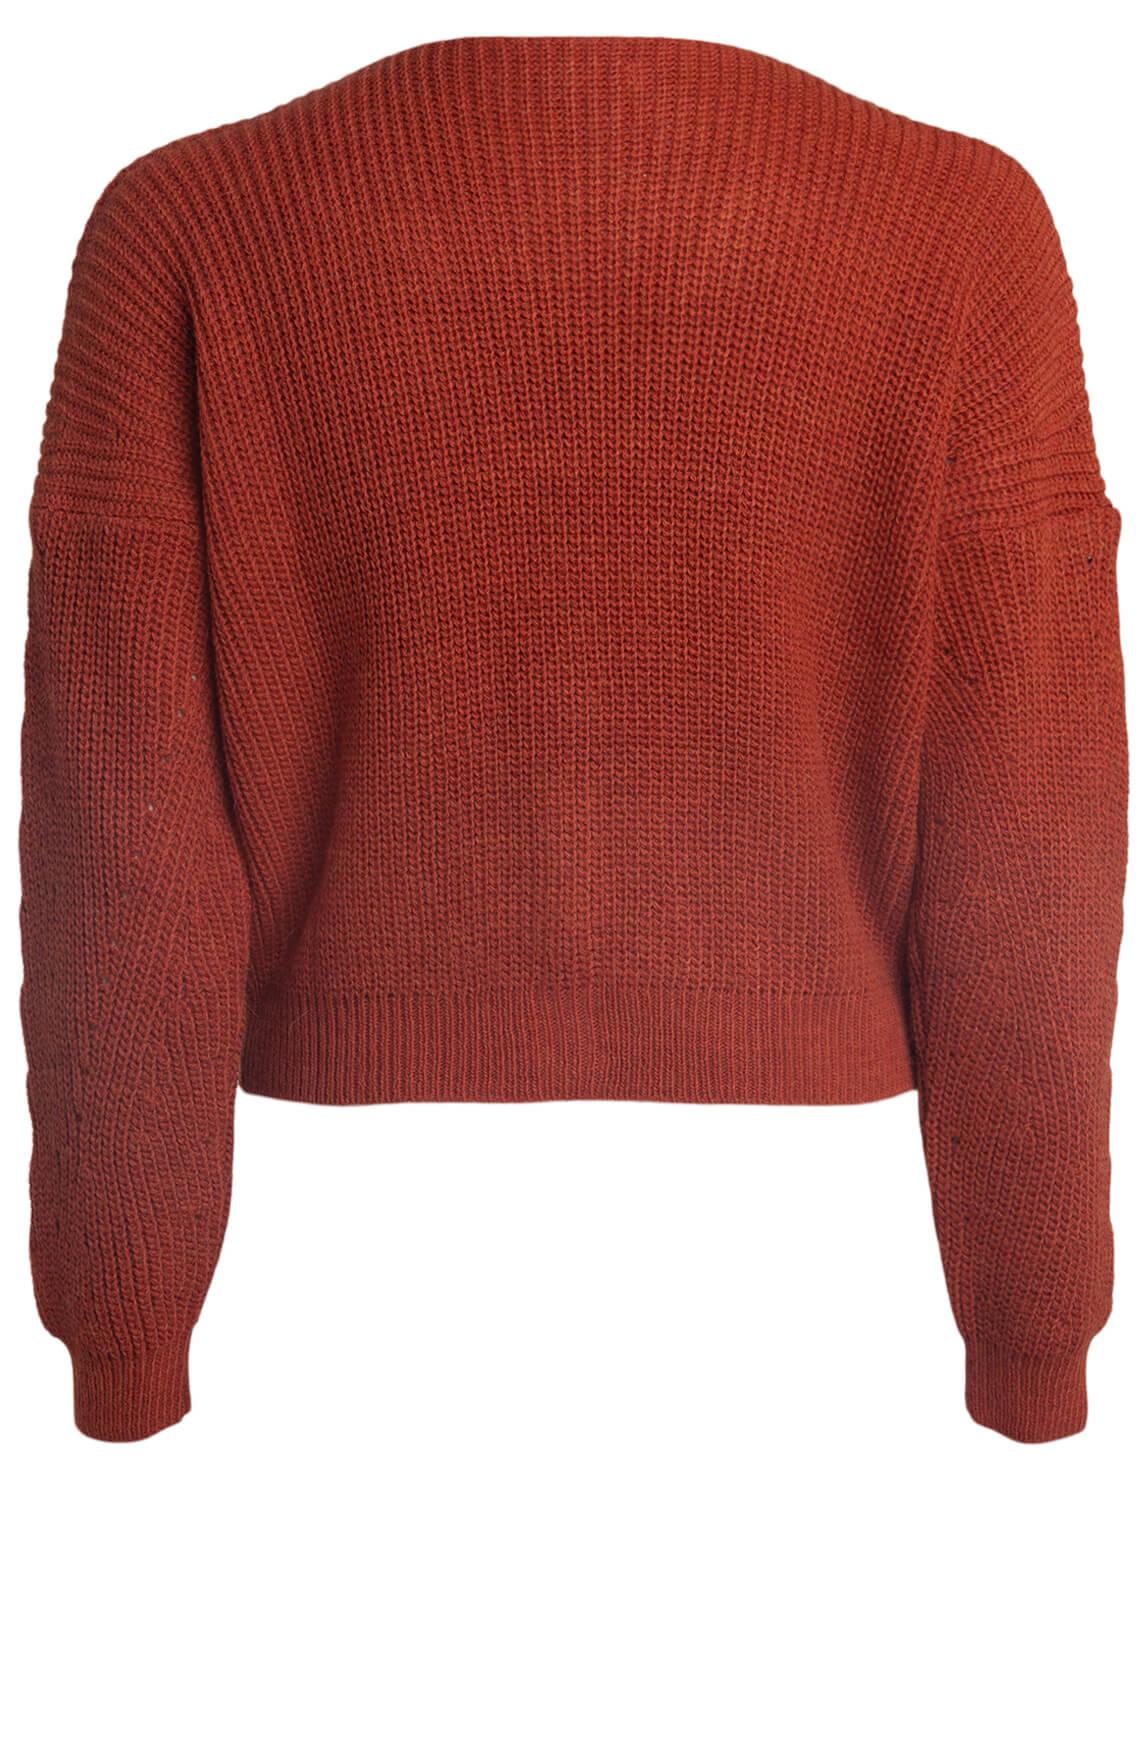 La Fée Maraboutée Dames Kort vest Oranje